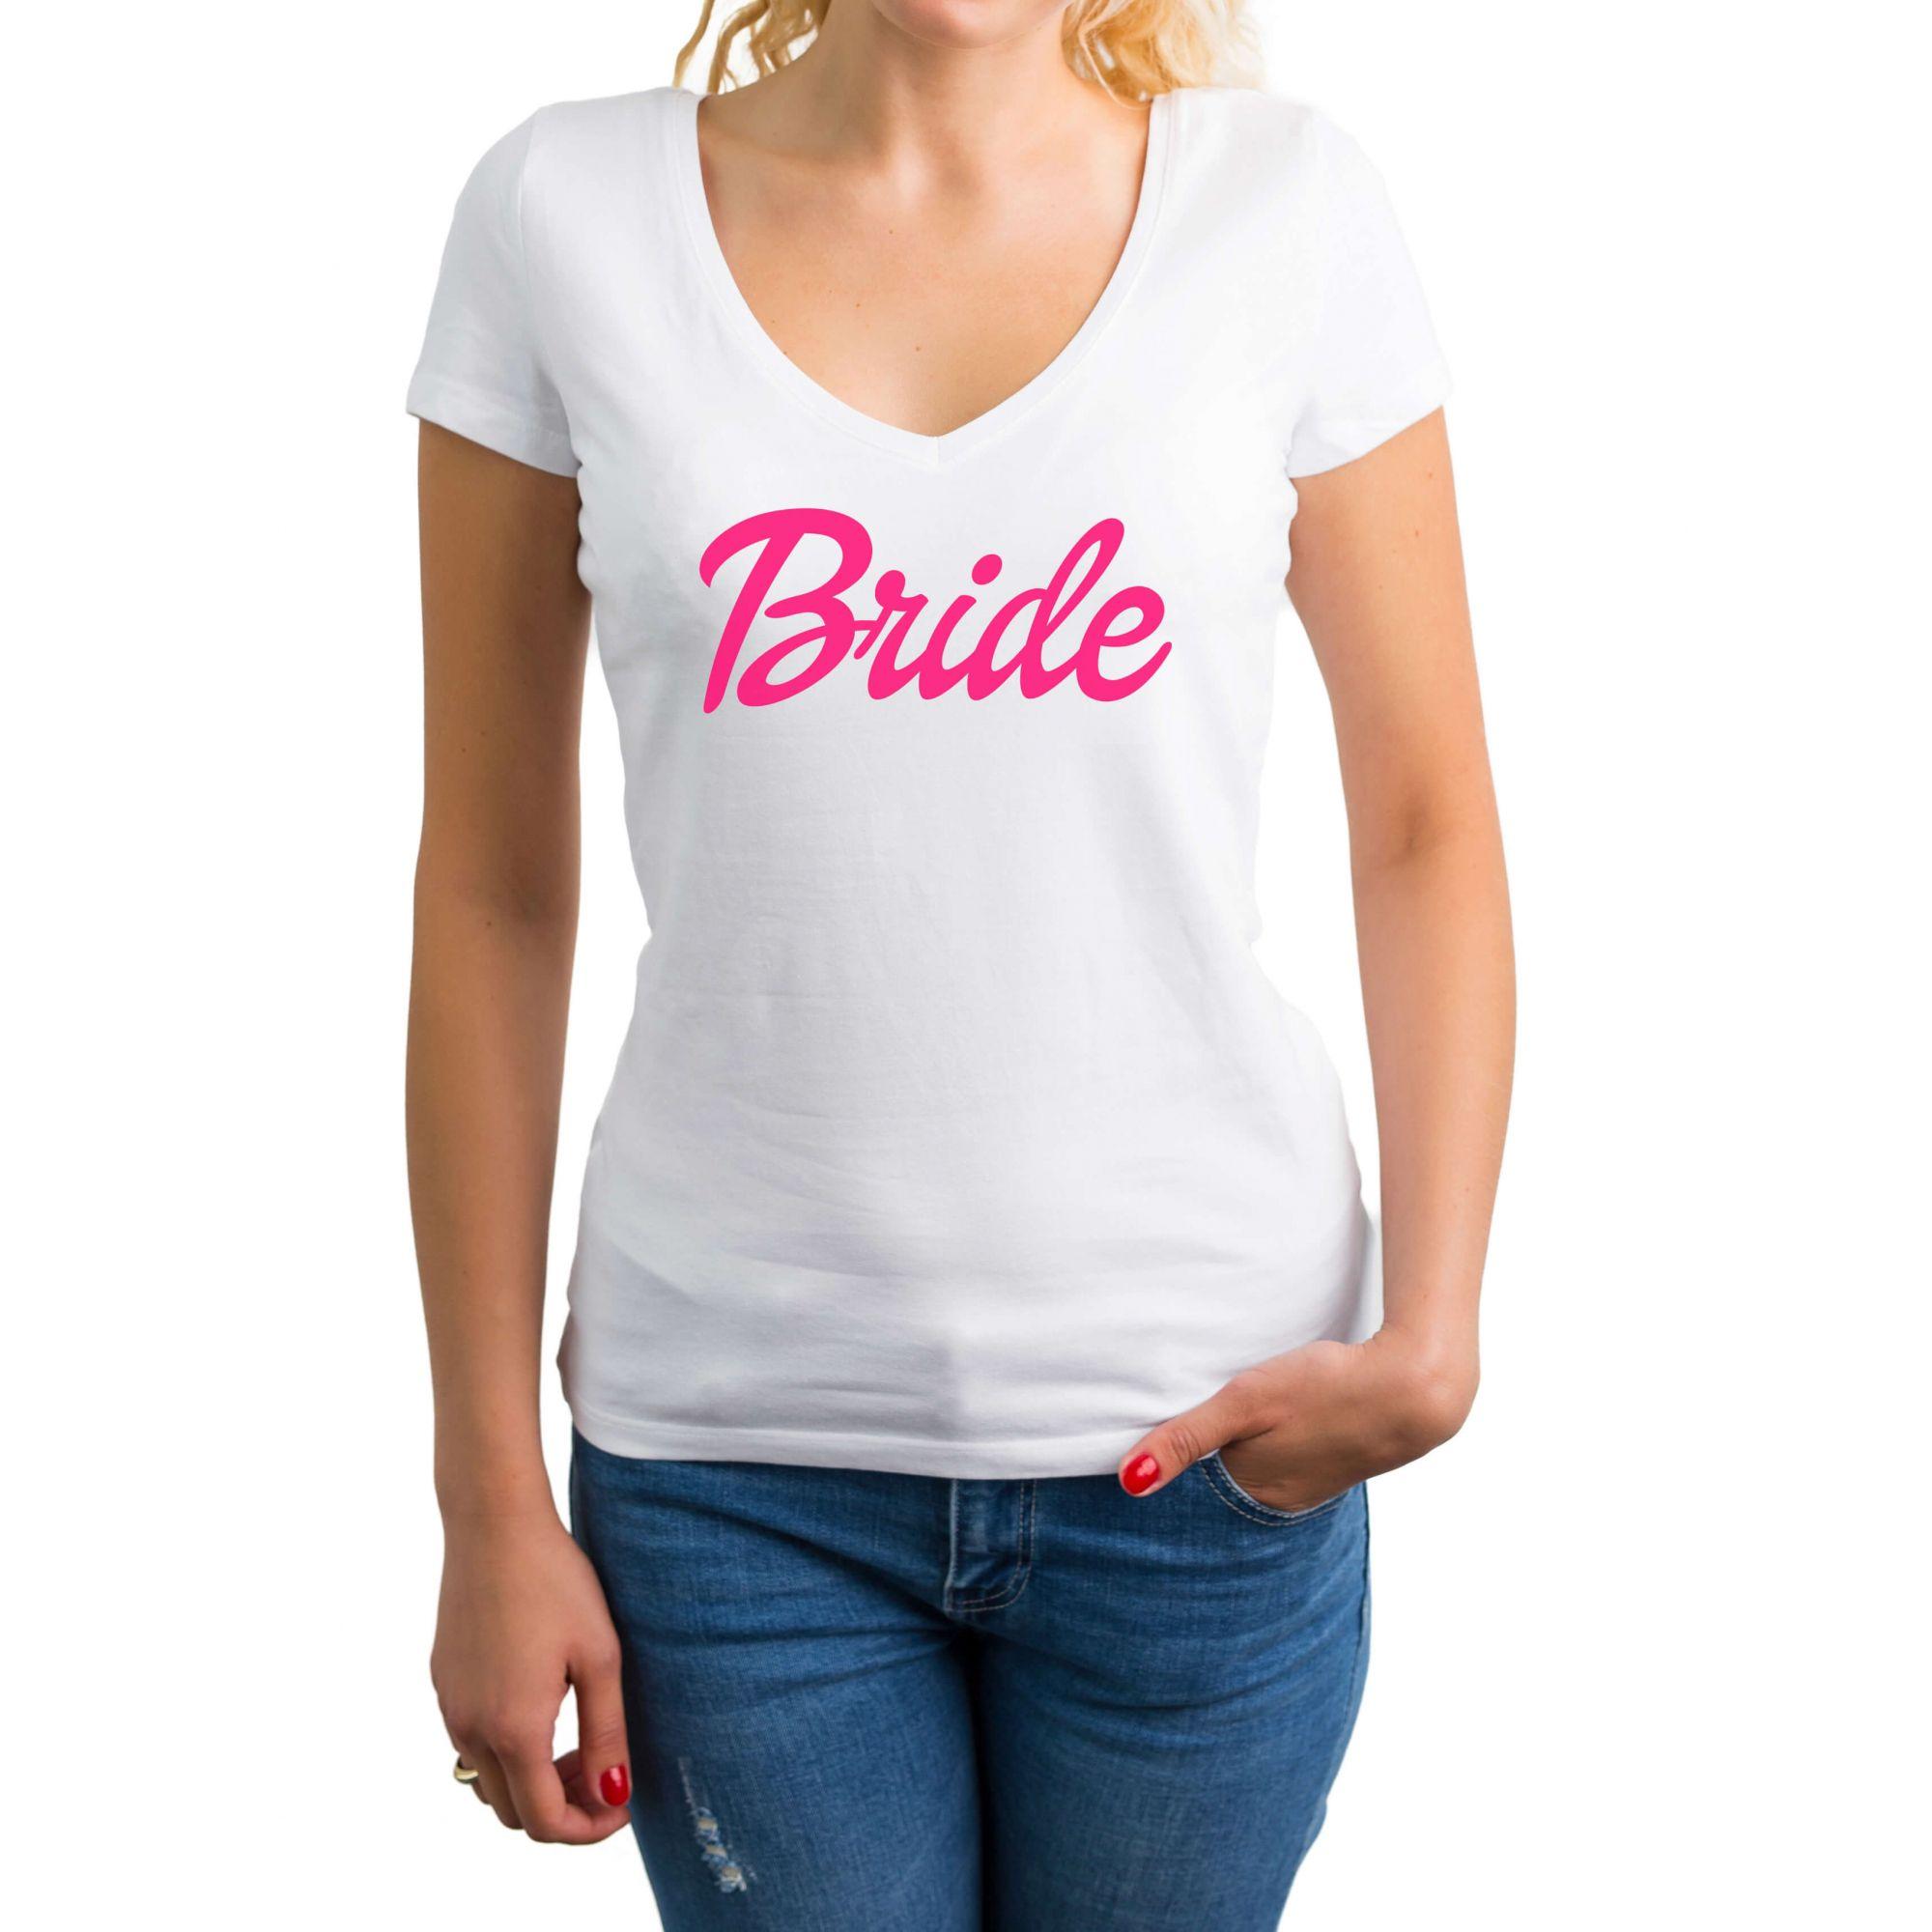 Camiseta Baby Look Gola V Bride Pronta Entrega para Despedida de Solteira